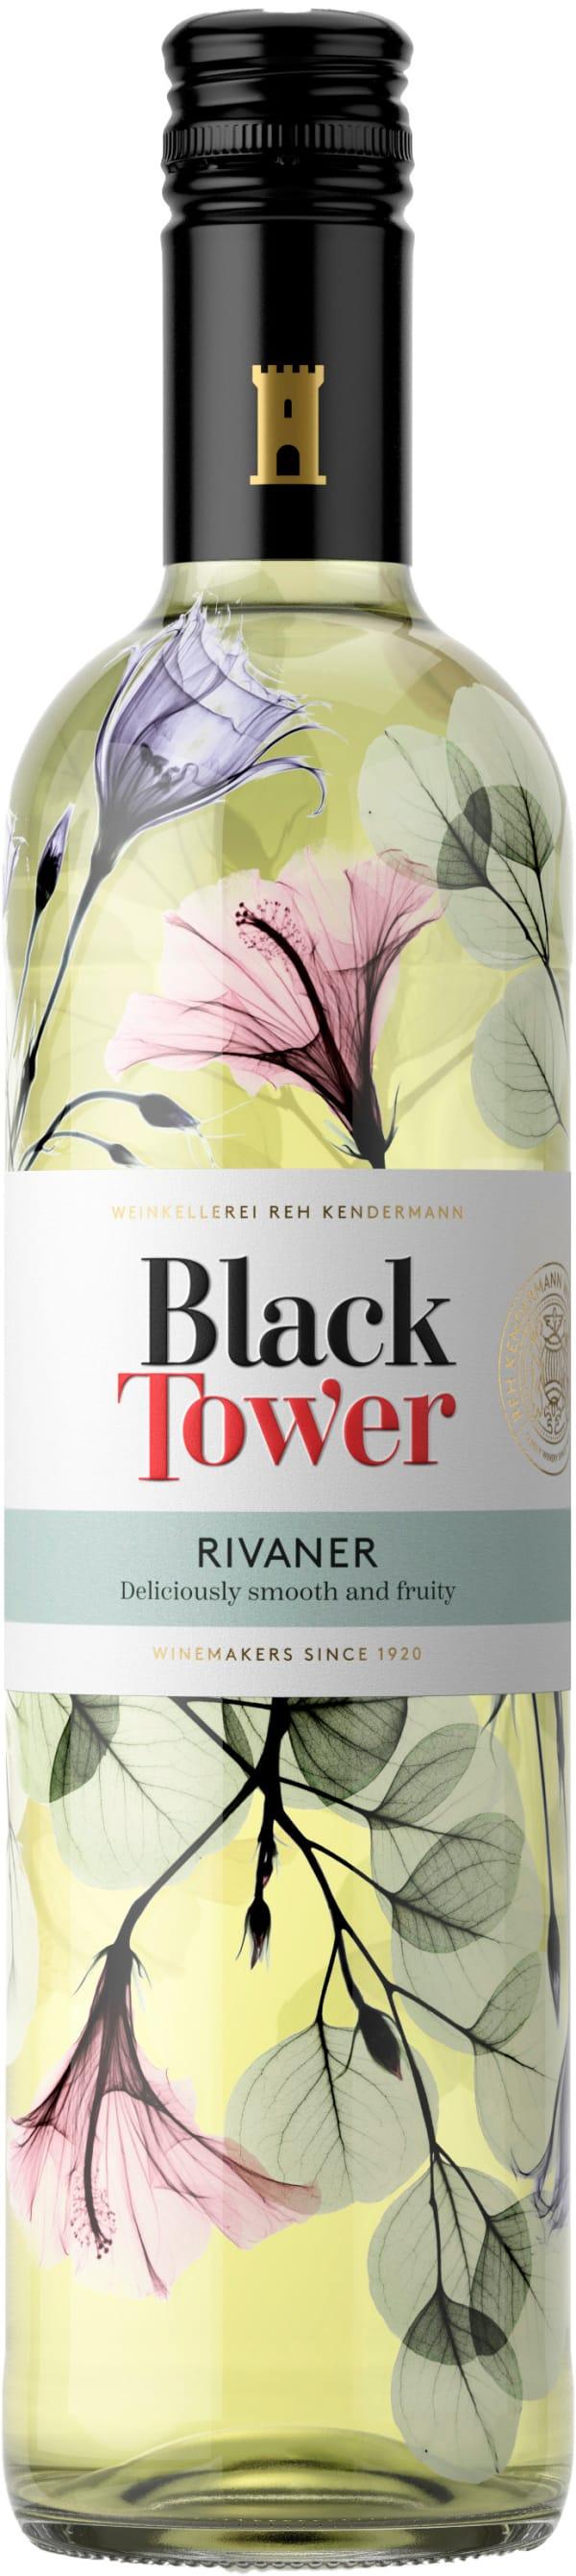 Black Tower Rivaner 2018